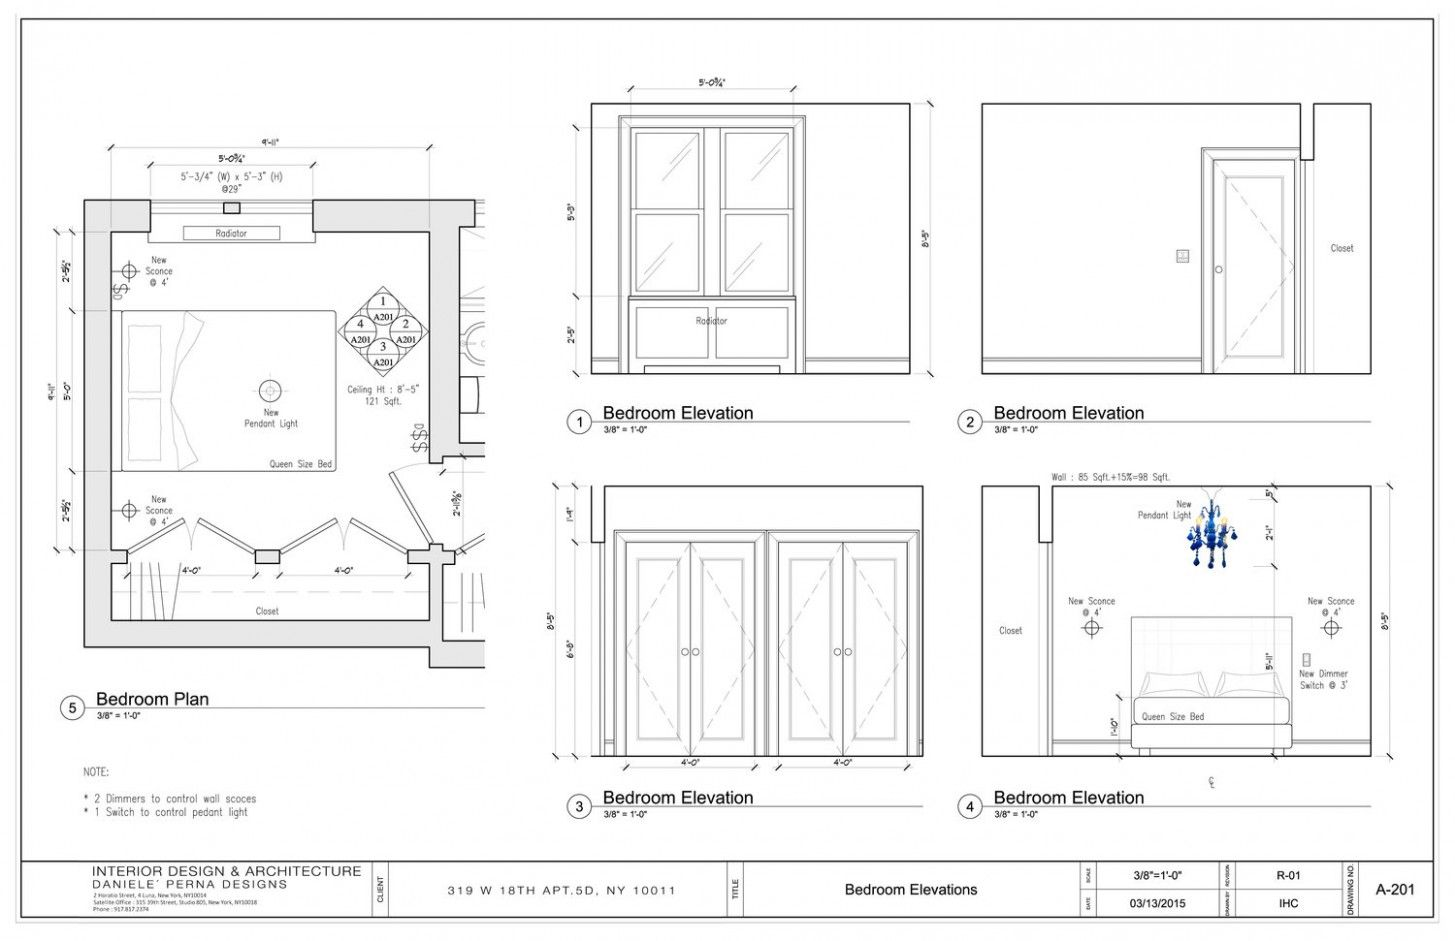 Bedroom Elevations Interior Design in 9  Interior design new